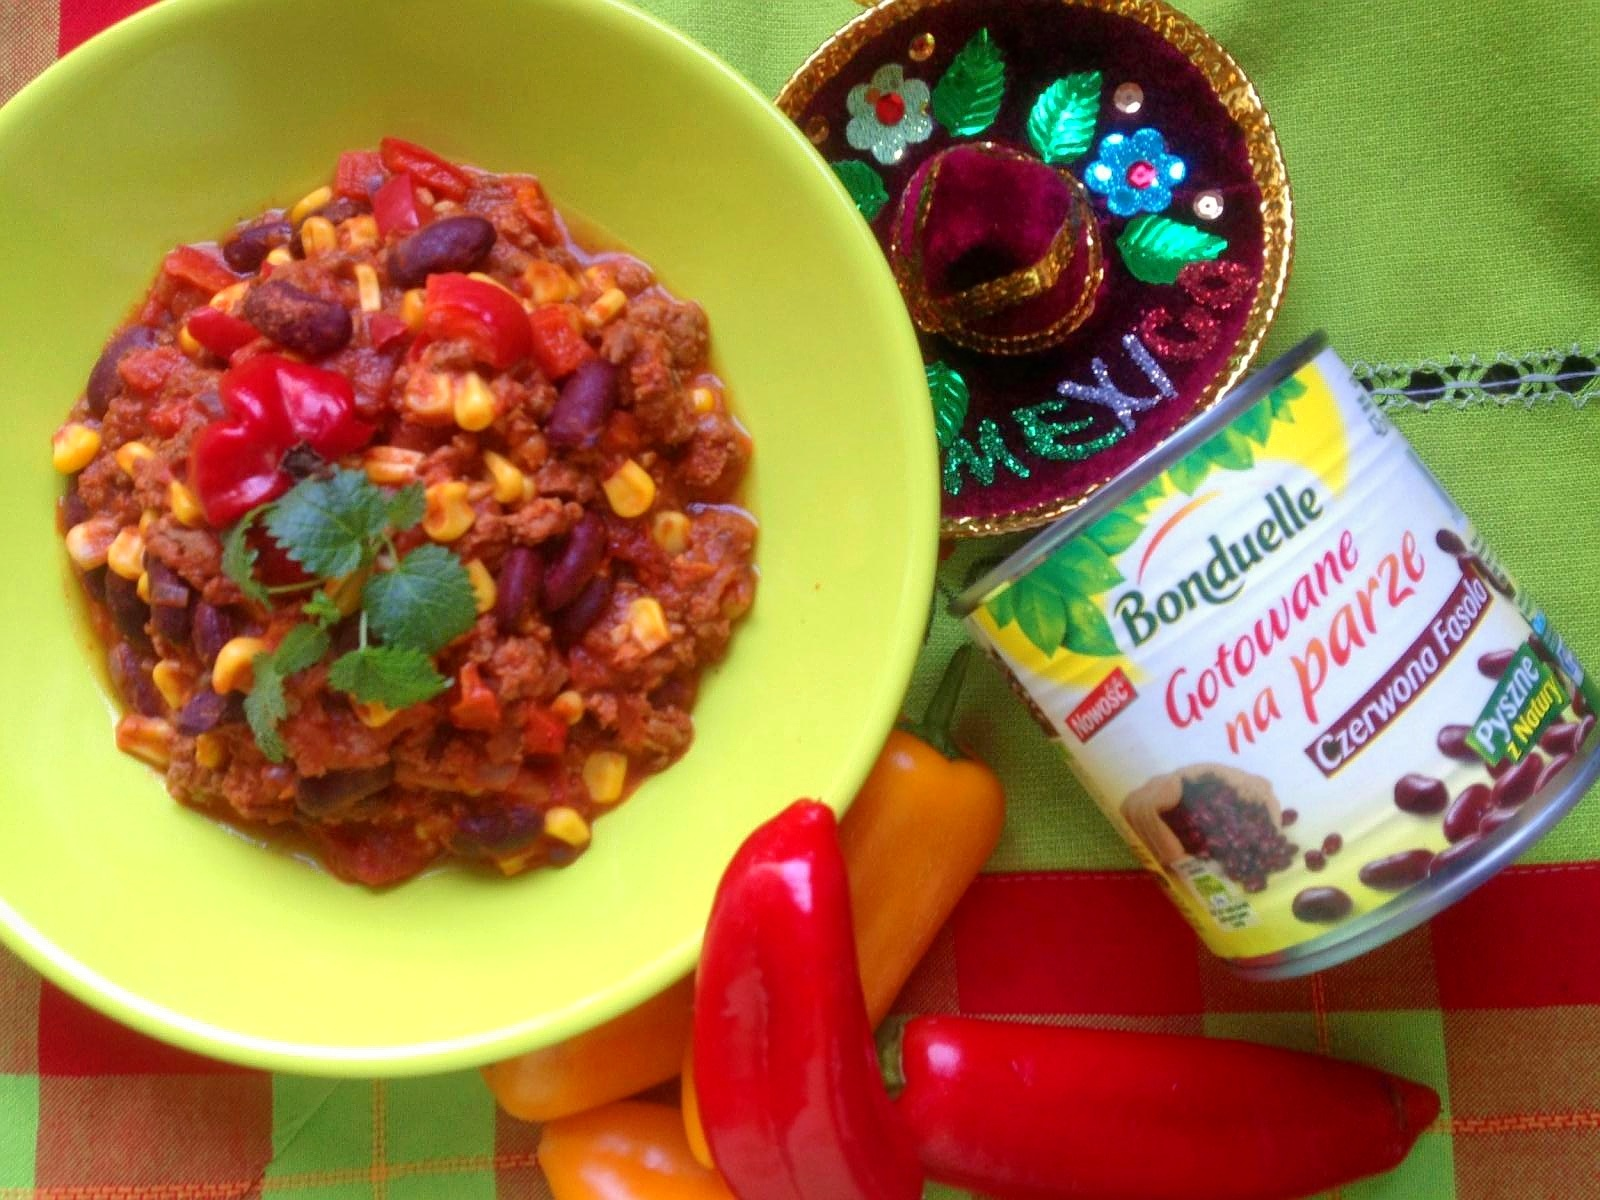 Ogniste chilli con carne z chrupiącymi warzywami.